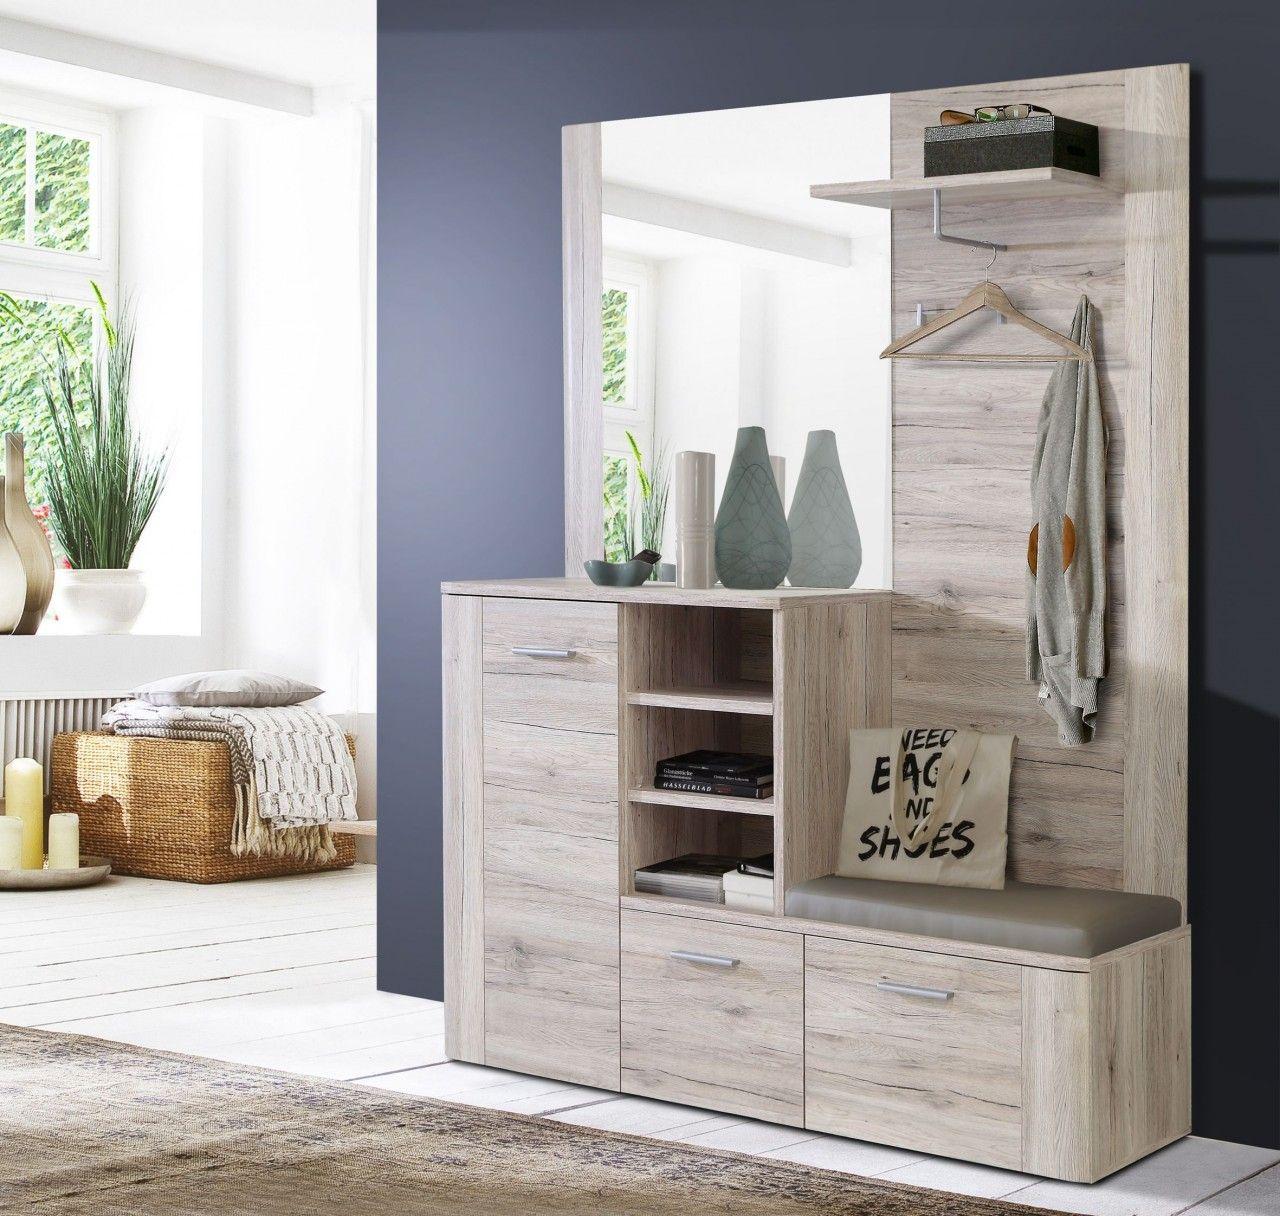 Garderobe Garderobenpaneel Haus Deko Und Kompaktgarderoben